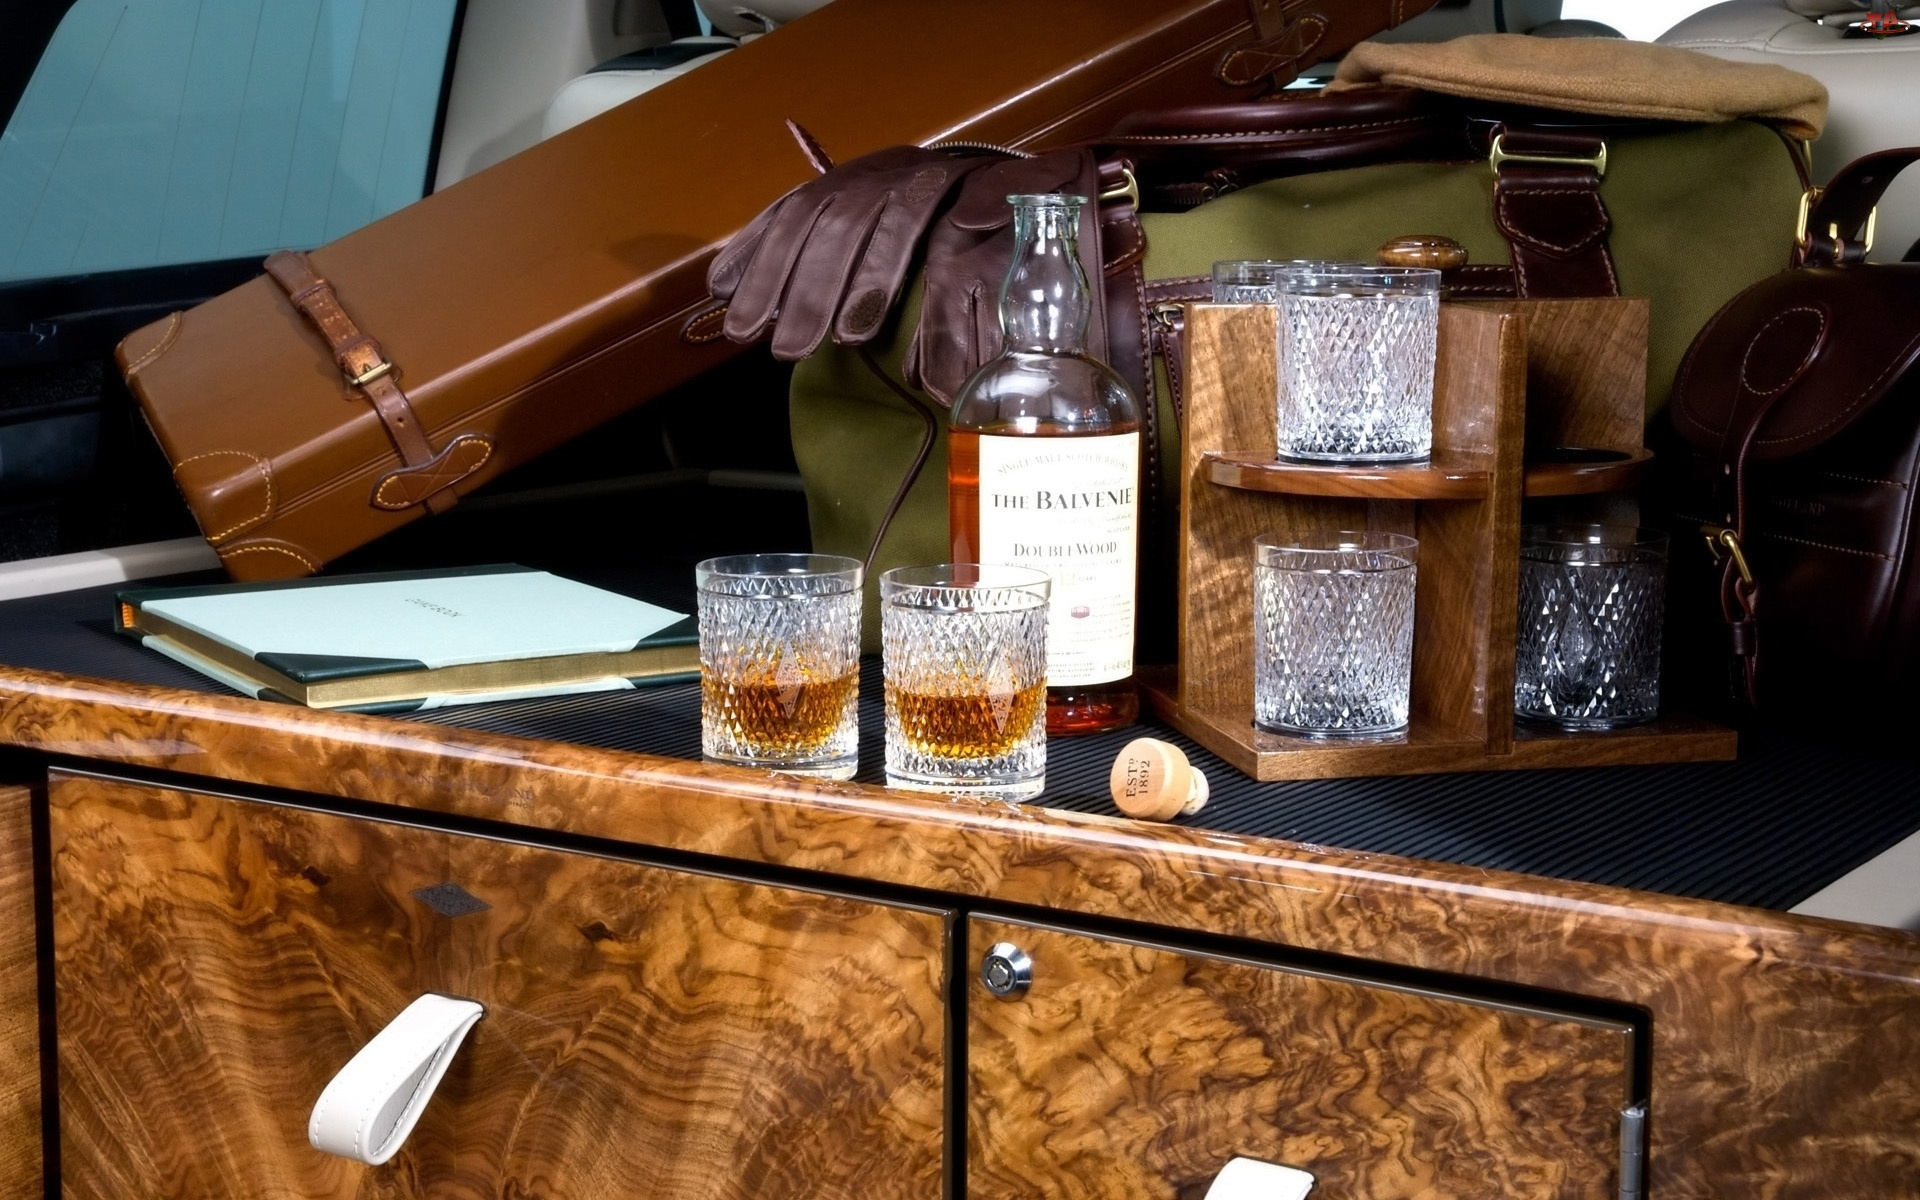 Futerał, Whisky, Szklanki, Balvenie, Torba